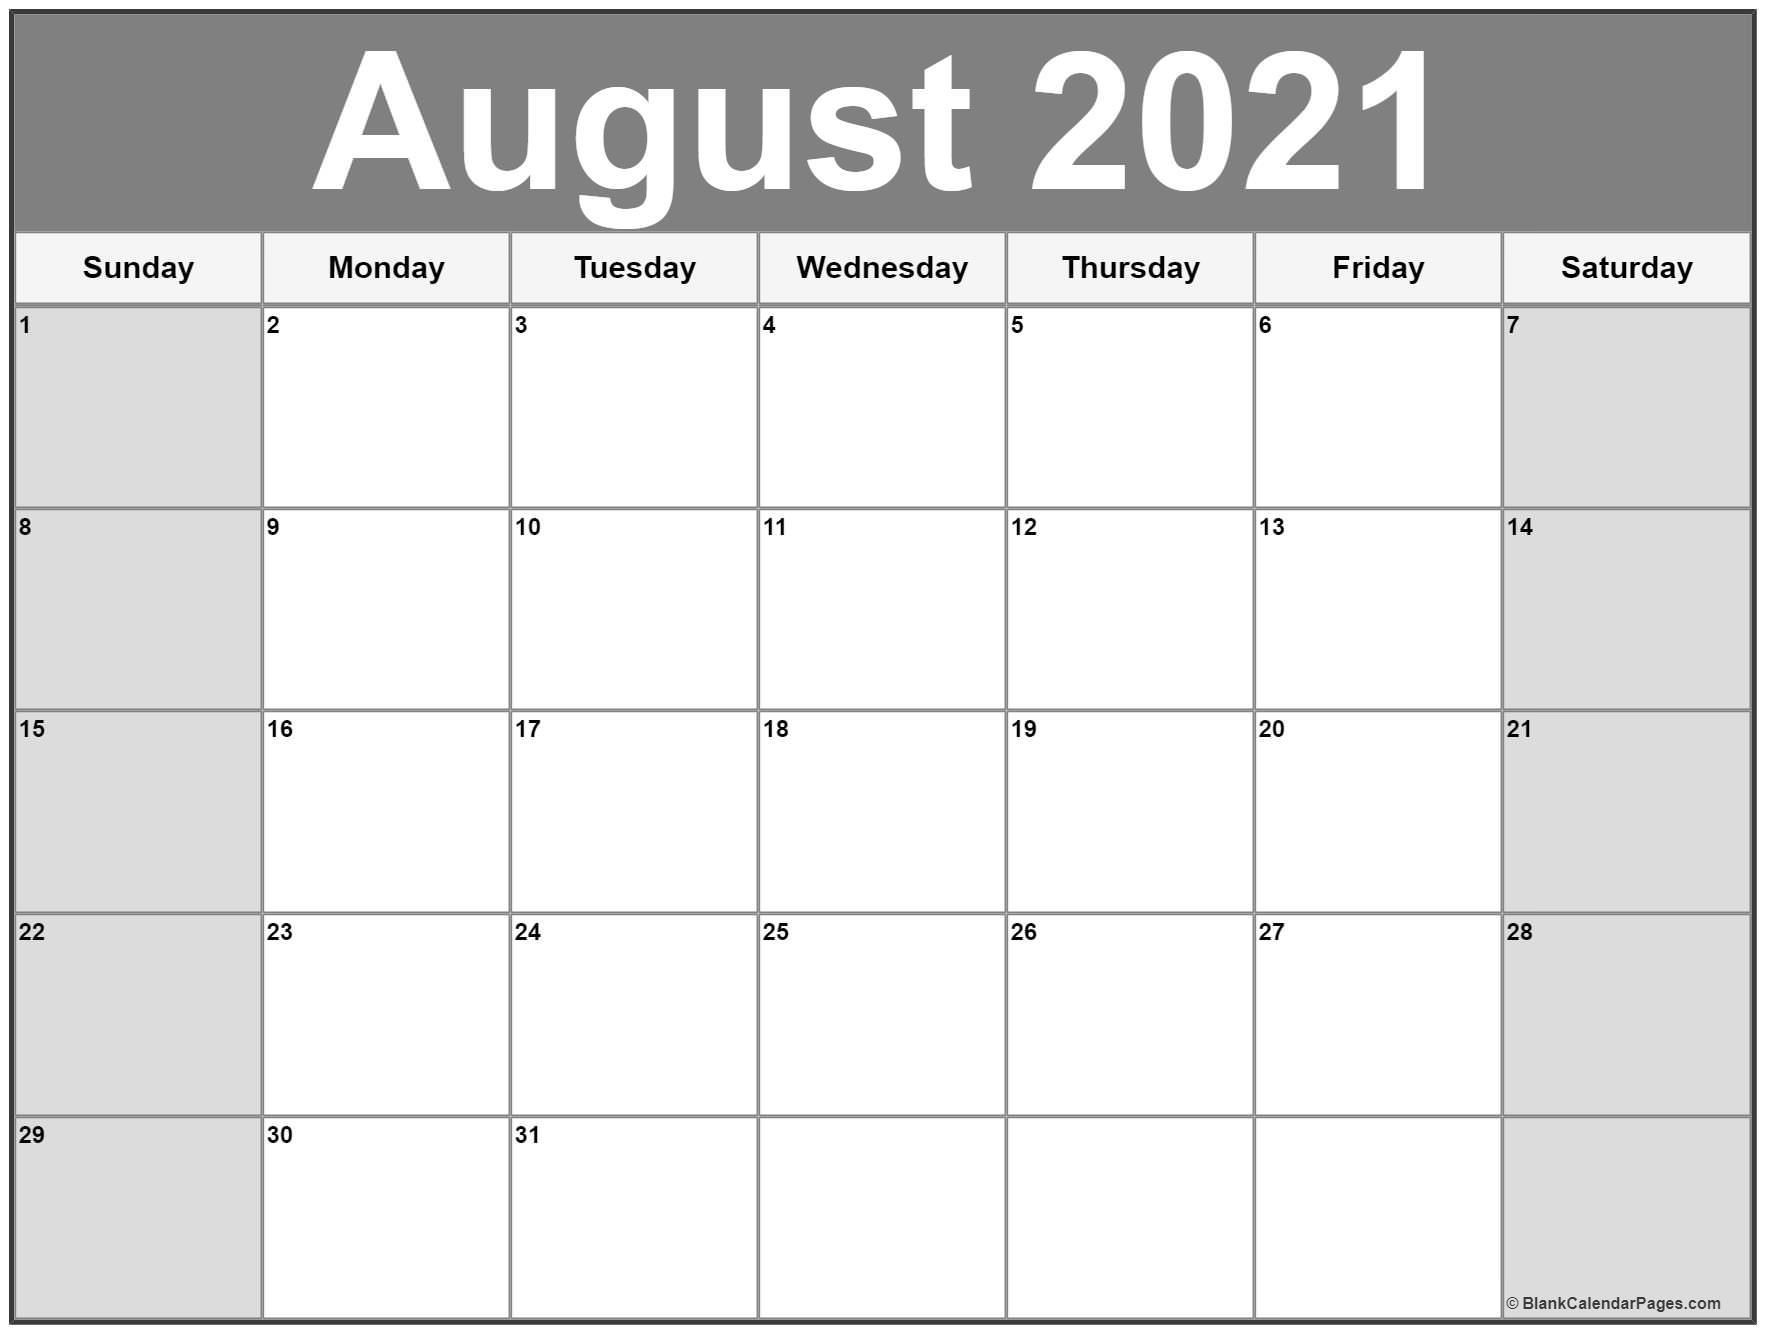 August 2021 Calendar | 56+ Templates Of 2021 Printable